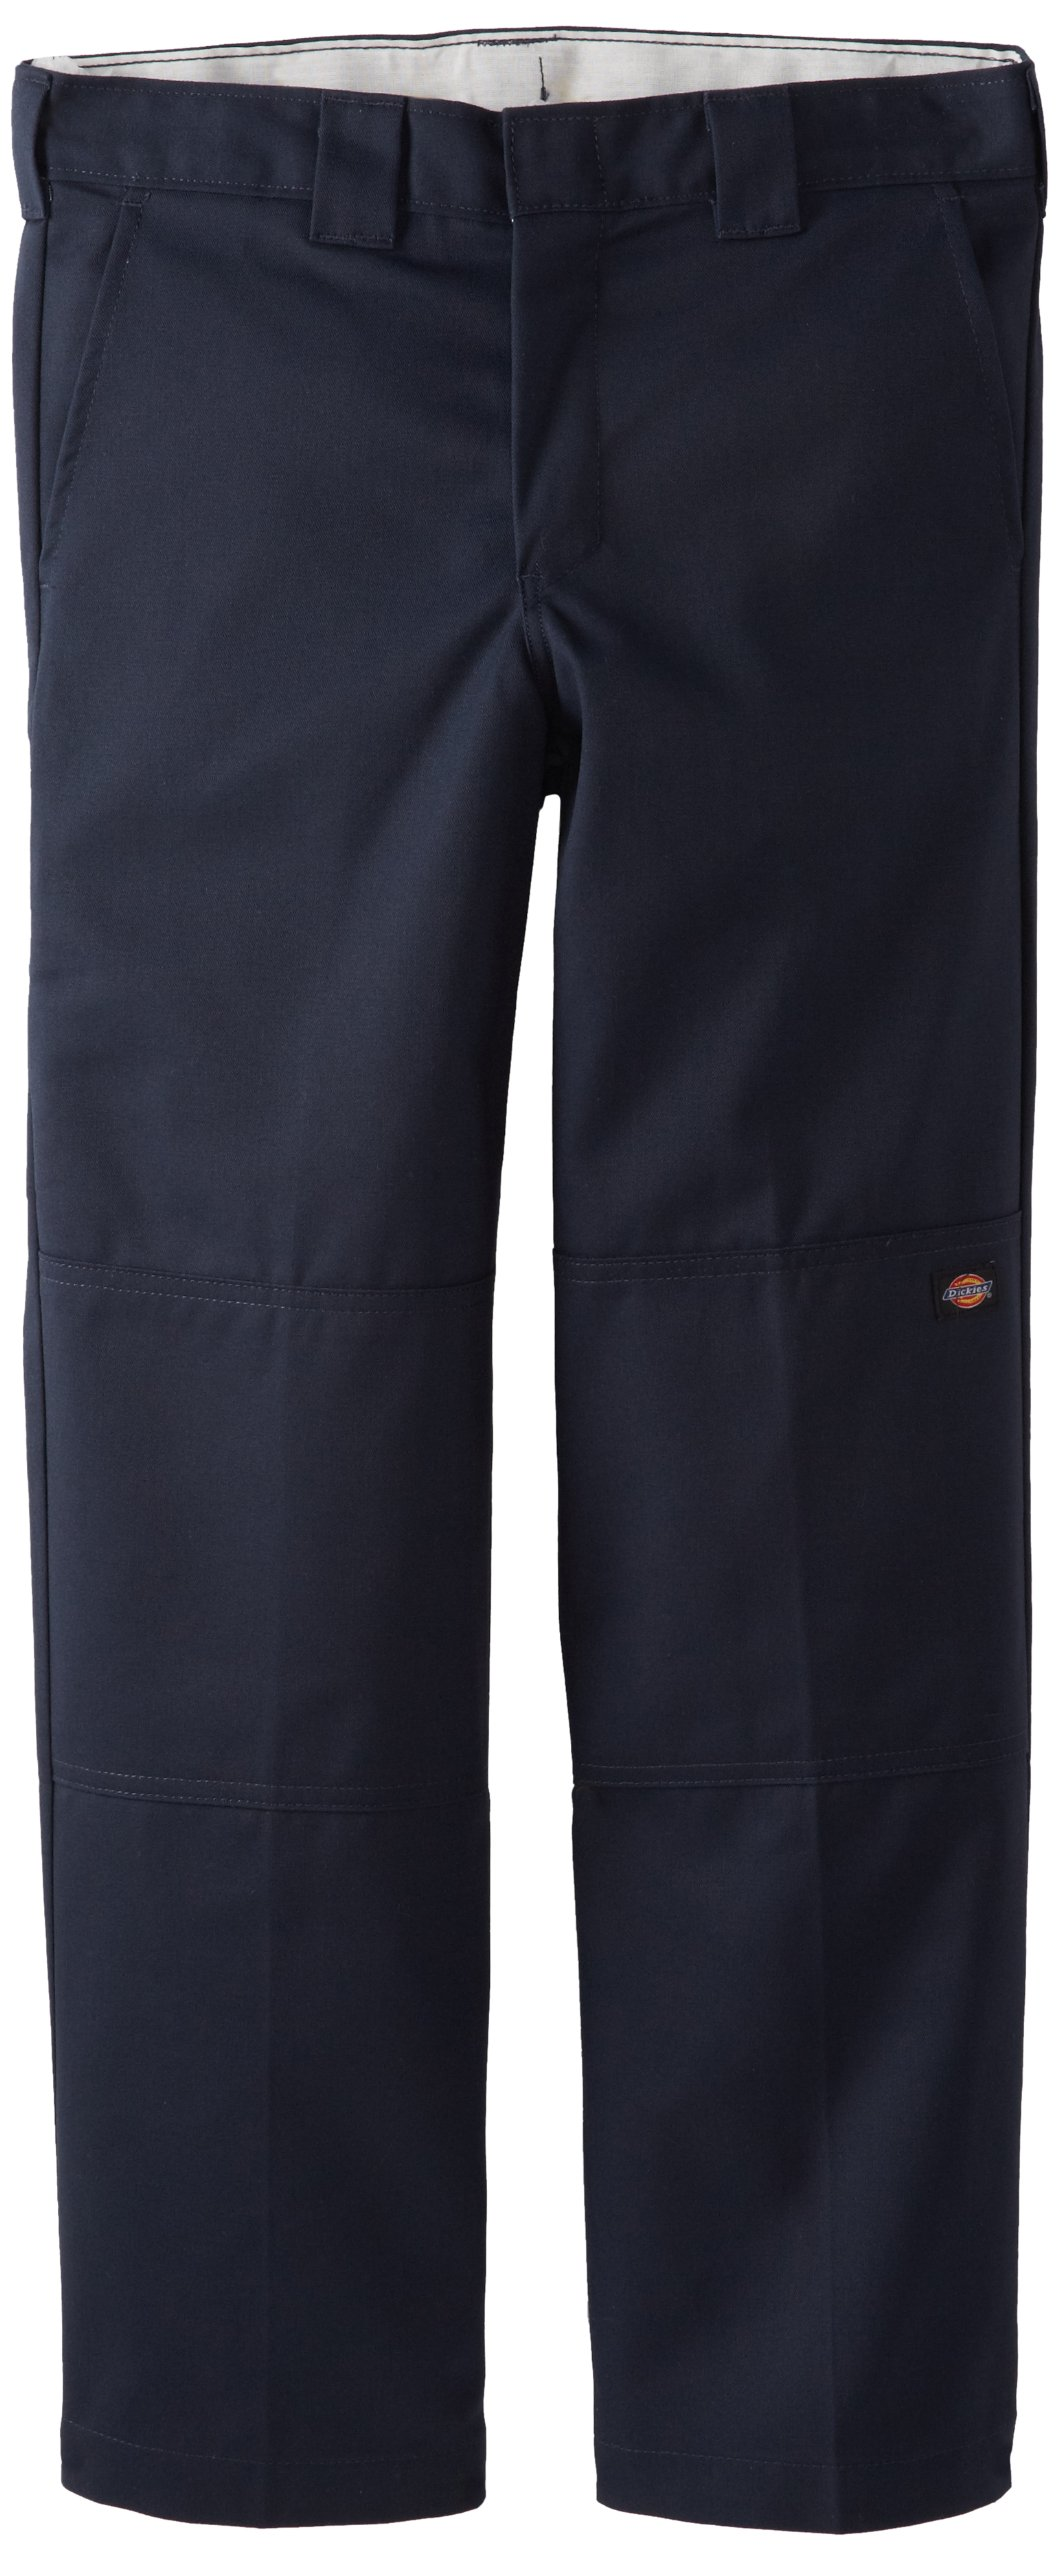 Dickies Big Boys' Flex Waist Double Knee Pant With Extra Pocket, Dark Navy, 18 Husky by Dickies (Image #1)